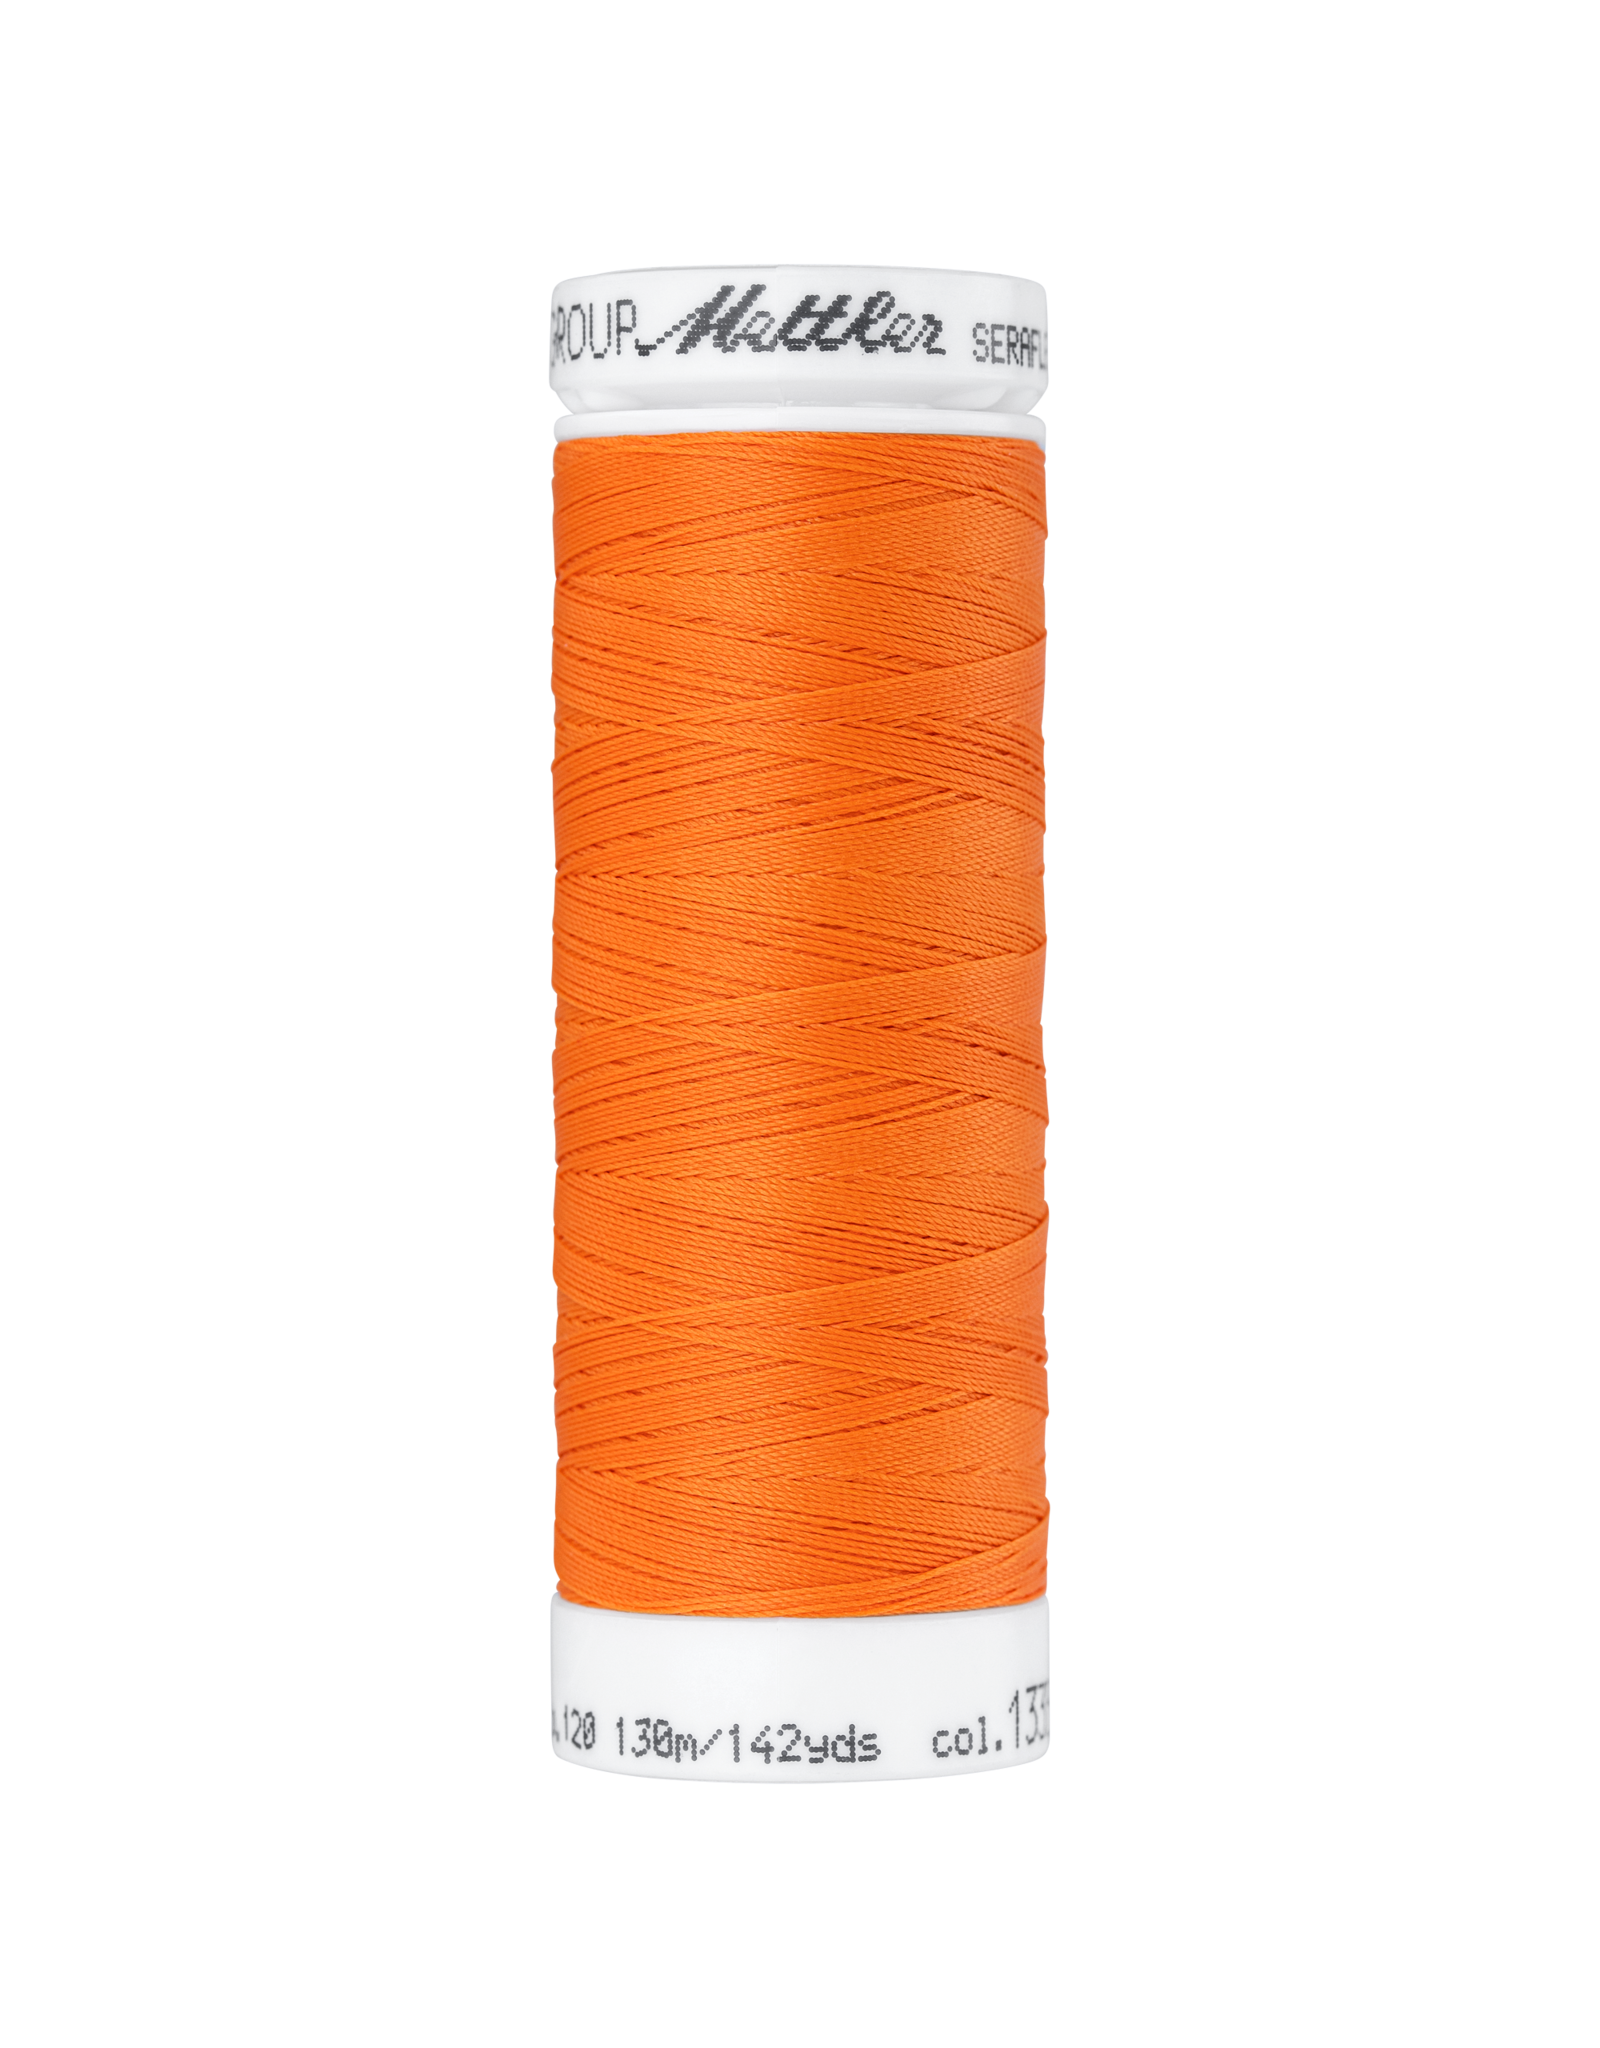 Mettler Seraflex elastisch naaigaren 1335